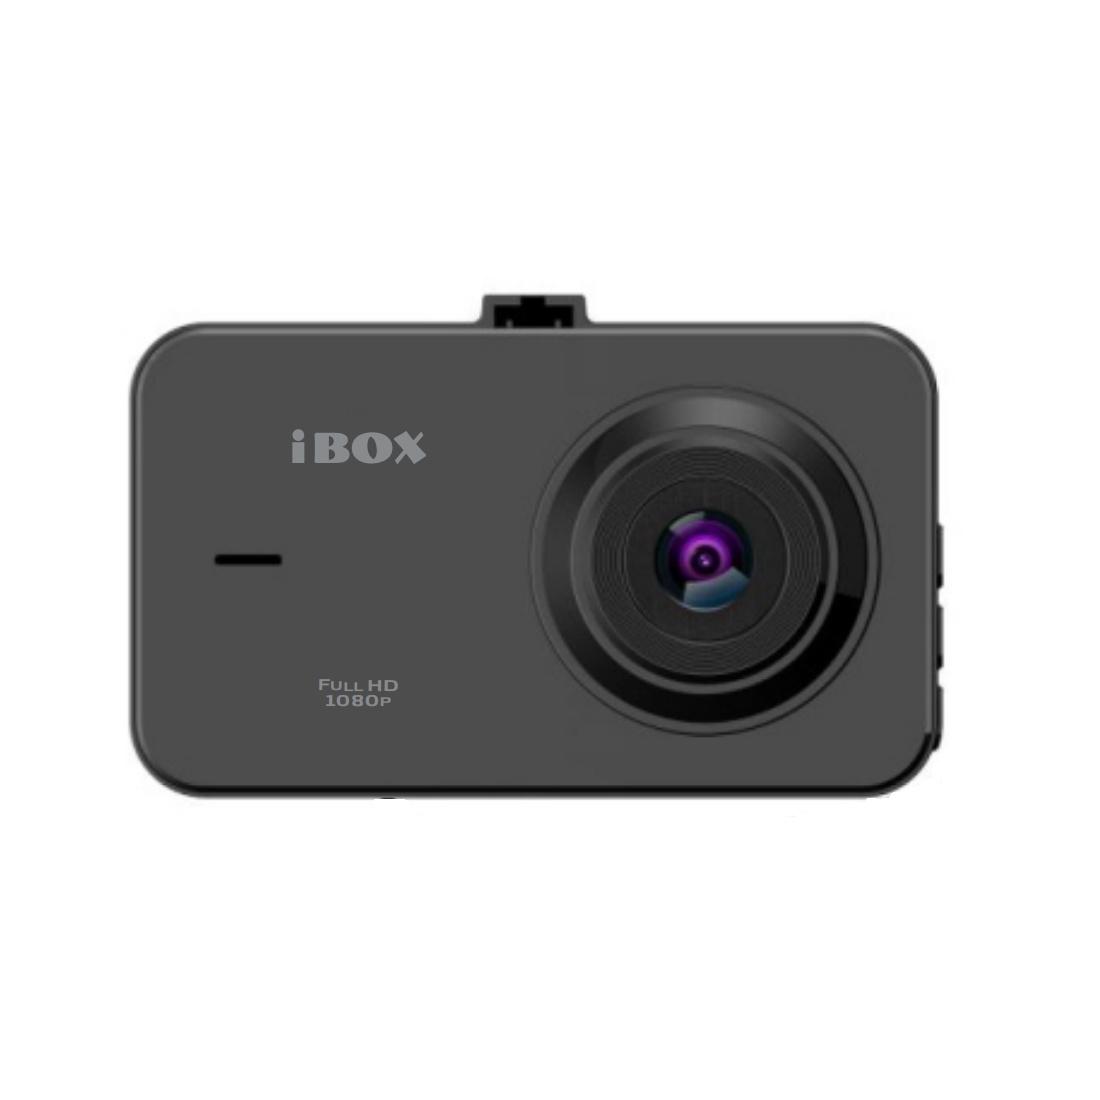 Videoregistrator-iBOX-Z-820-155476953